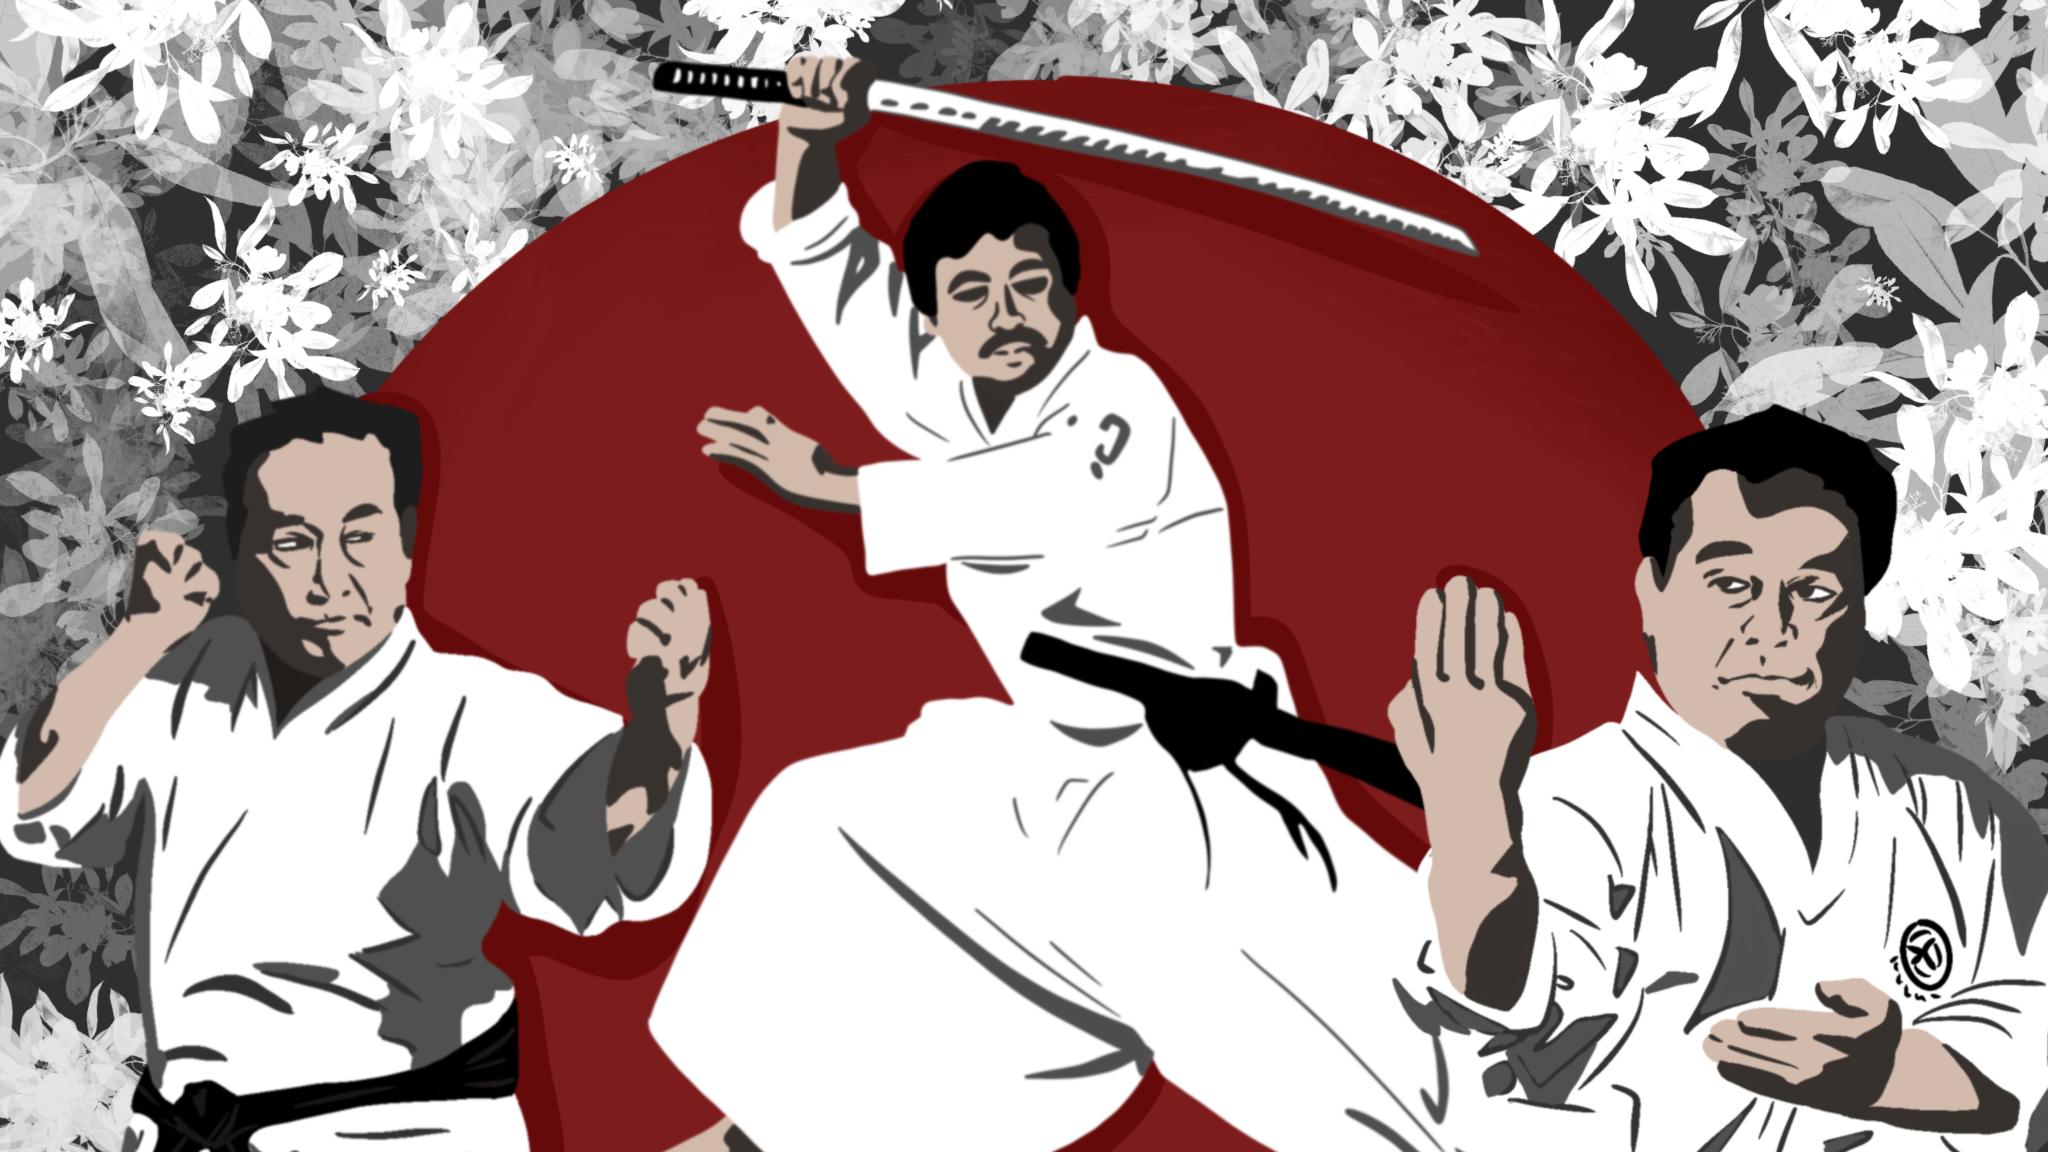 National Karate Kobudo Federation Sensei Collection Katana Iaido Sword Samurai Logo